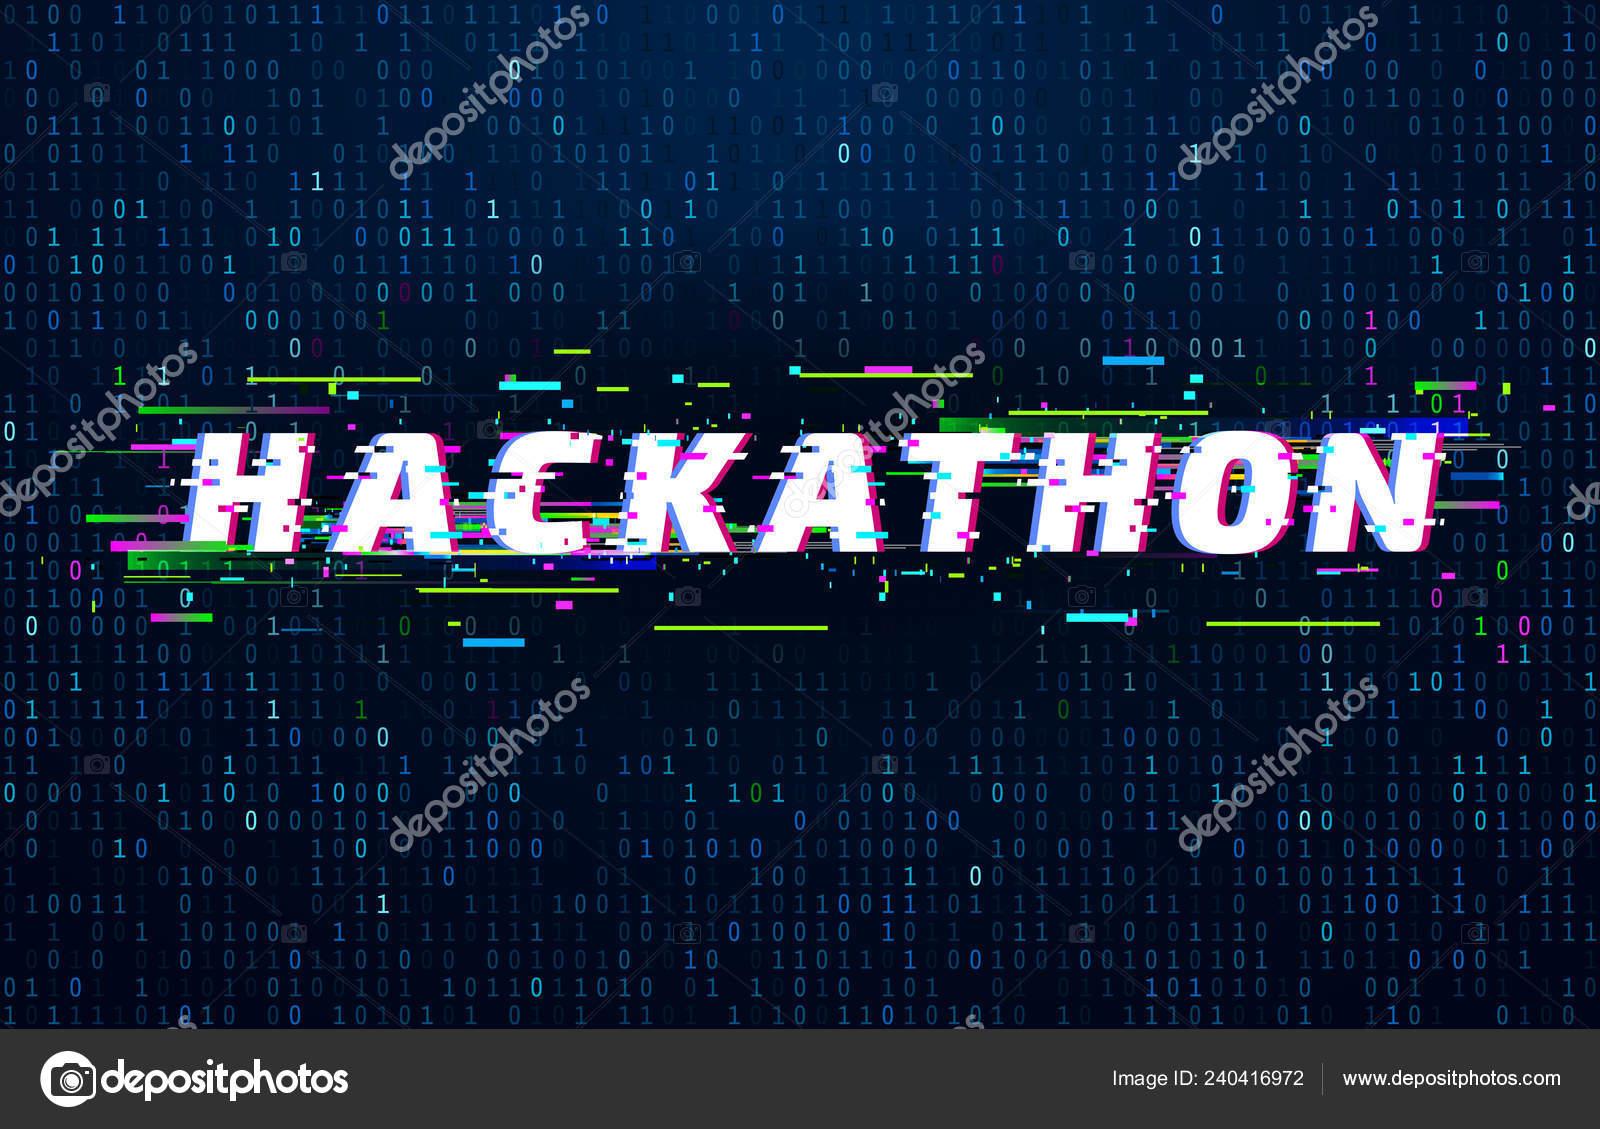 Hackathon poster   Hackathon background  Hack marathon